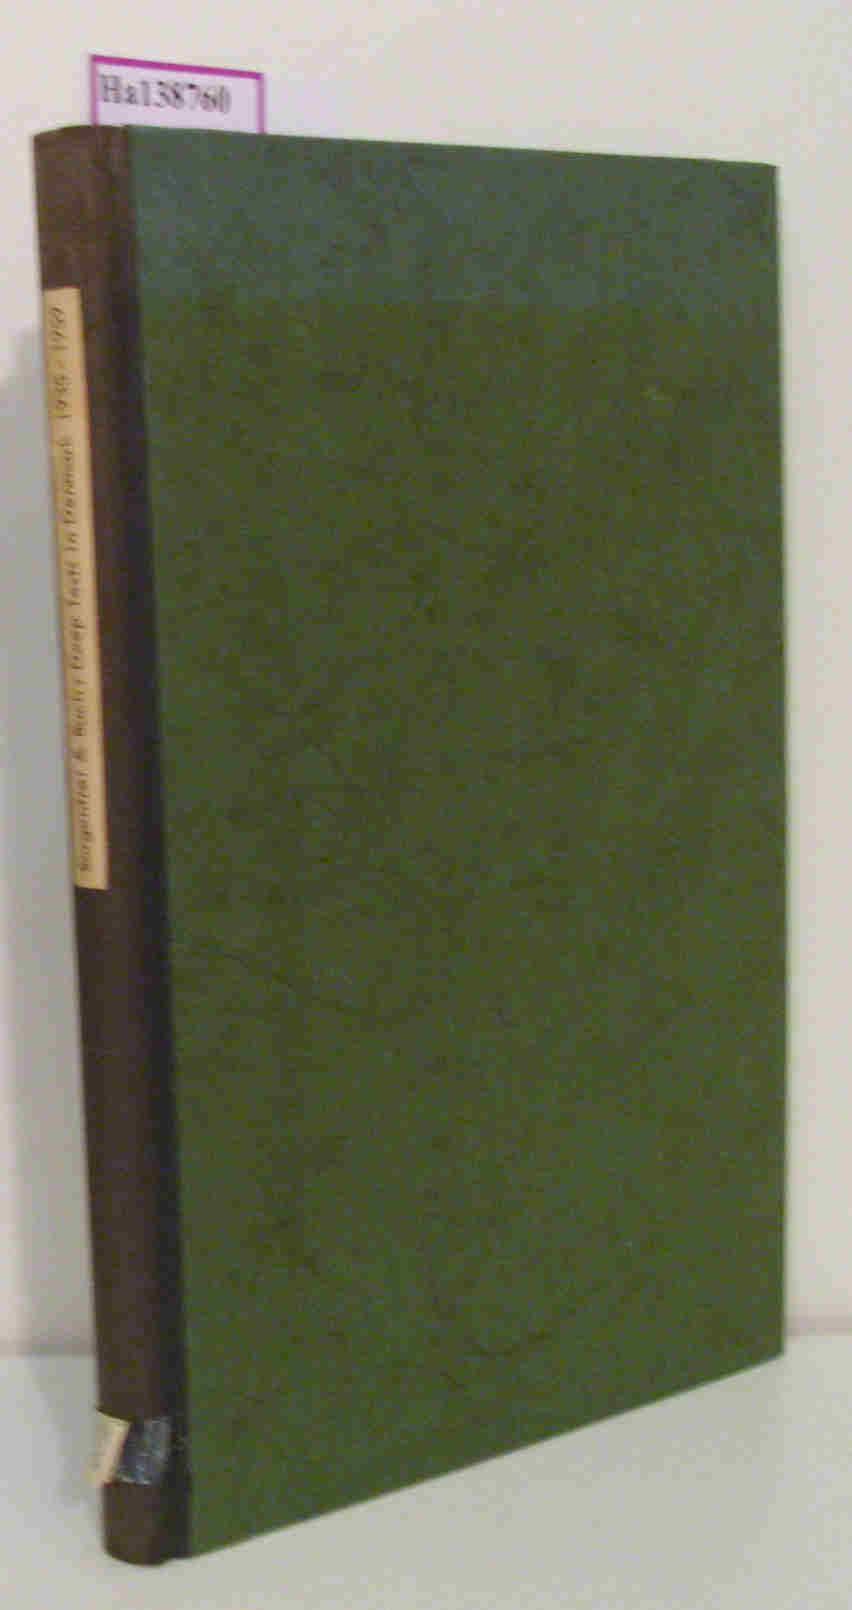 Deep Tests in Denmark. 1935-1959.